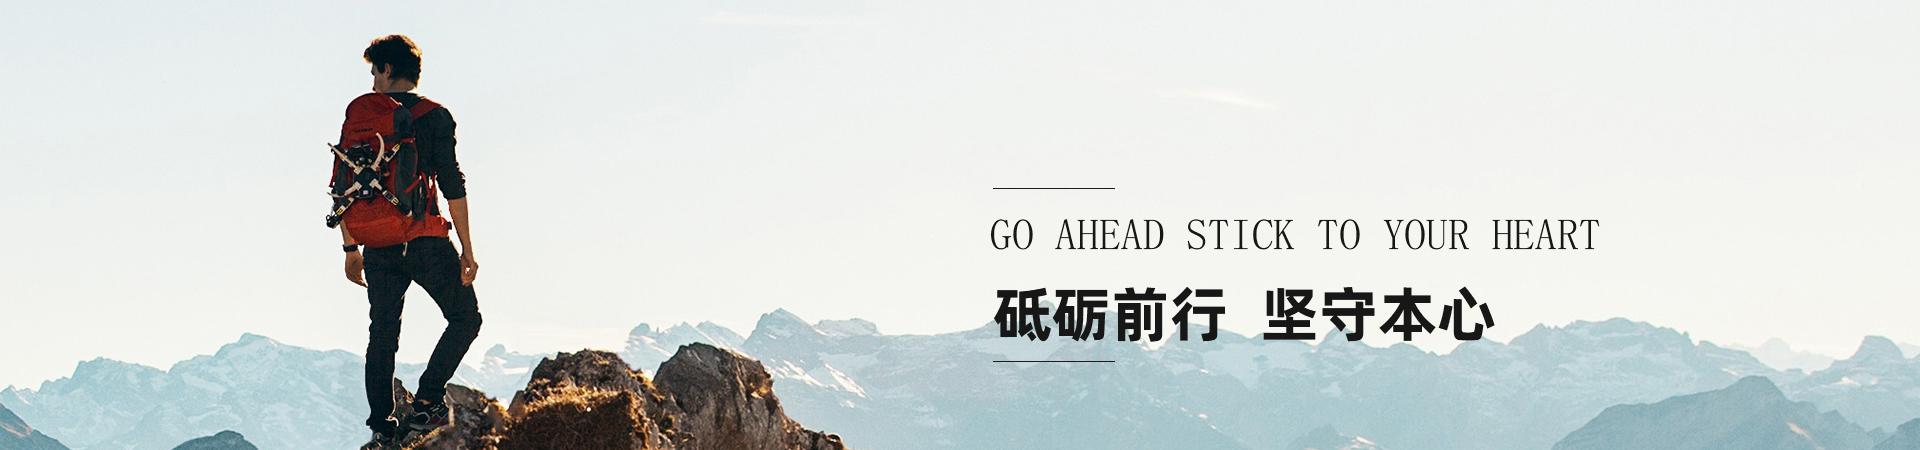 http://www.jrxipan.com/data/upload/201911/20191121141310_321.jpg